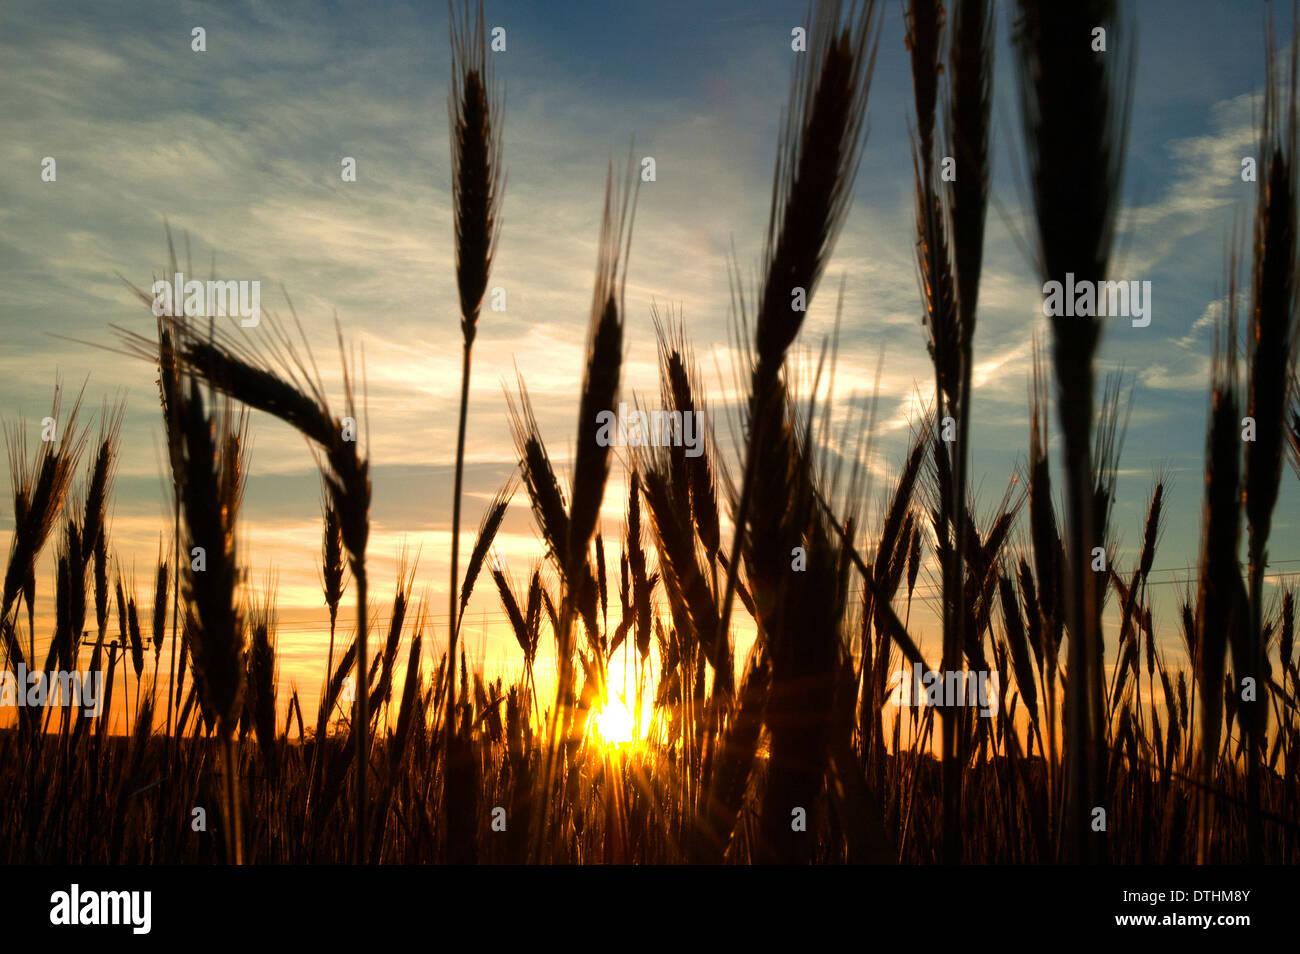 wheat field at sunrise - Stock Image